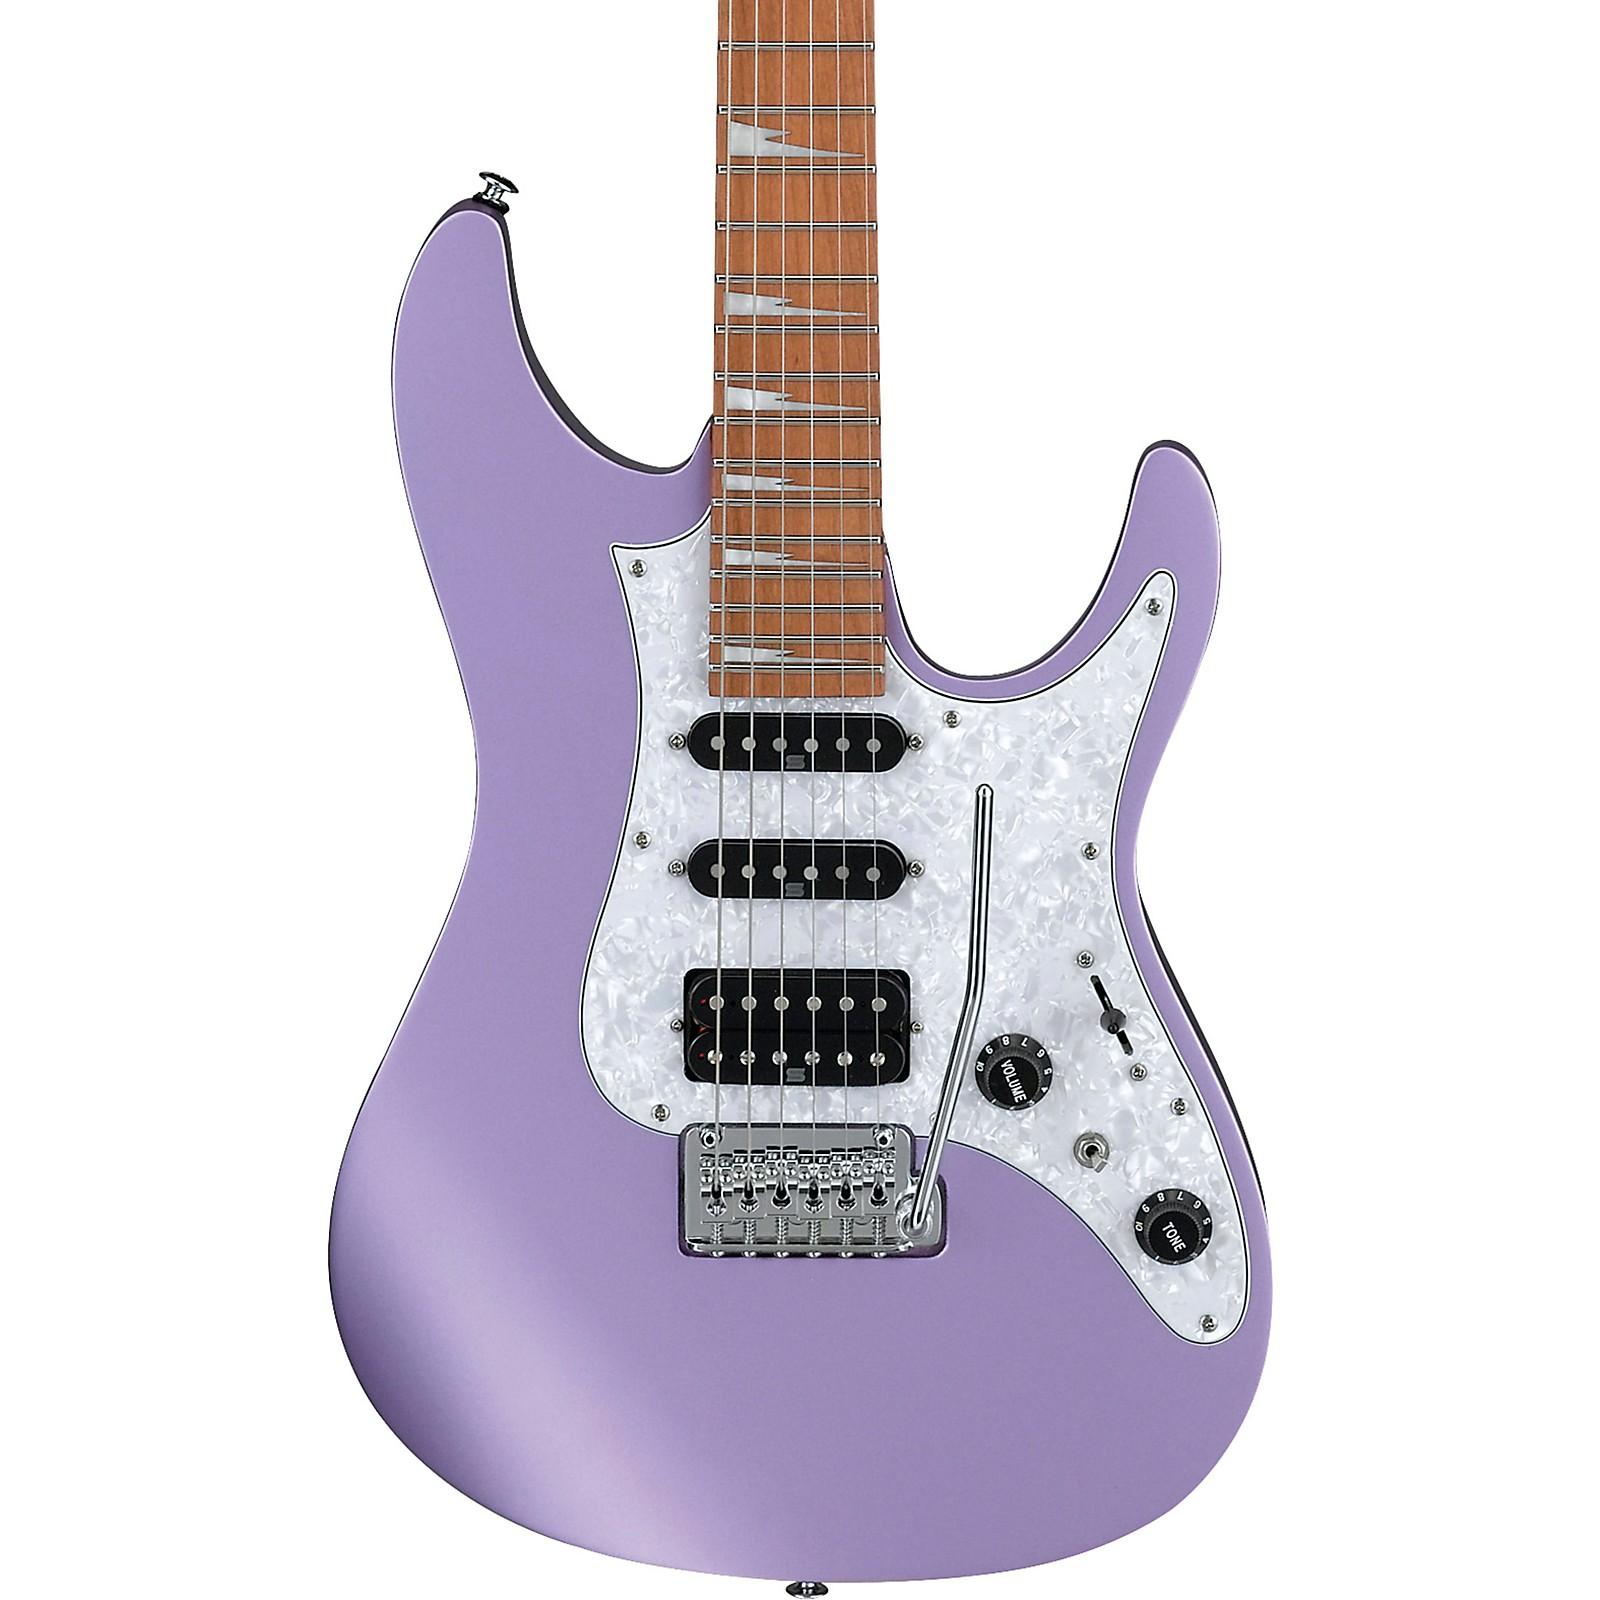 Ibanez MAR10 Mario Camarena Signature Electric Guitar